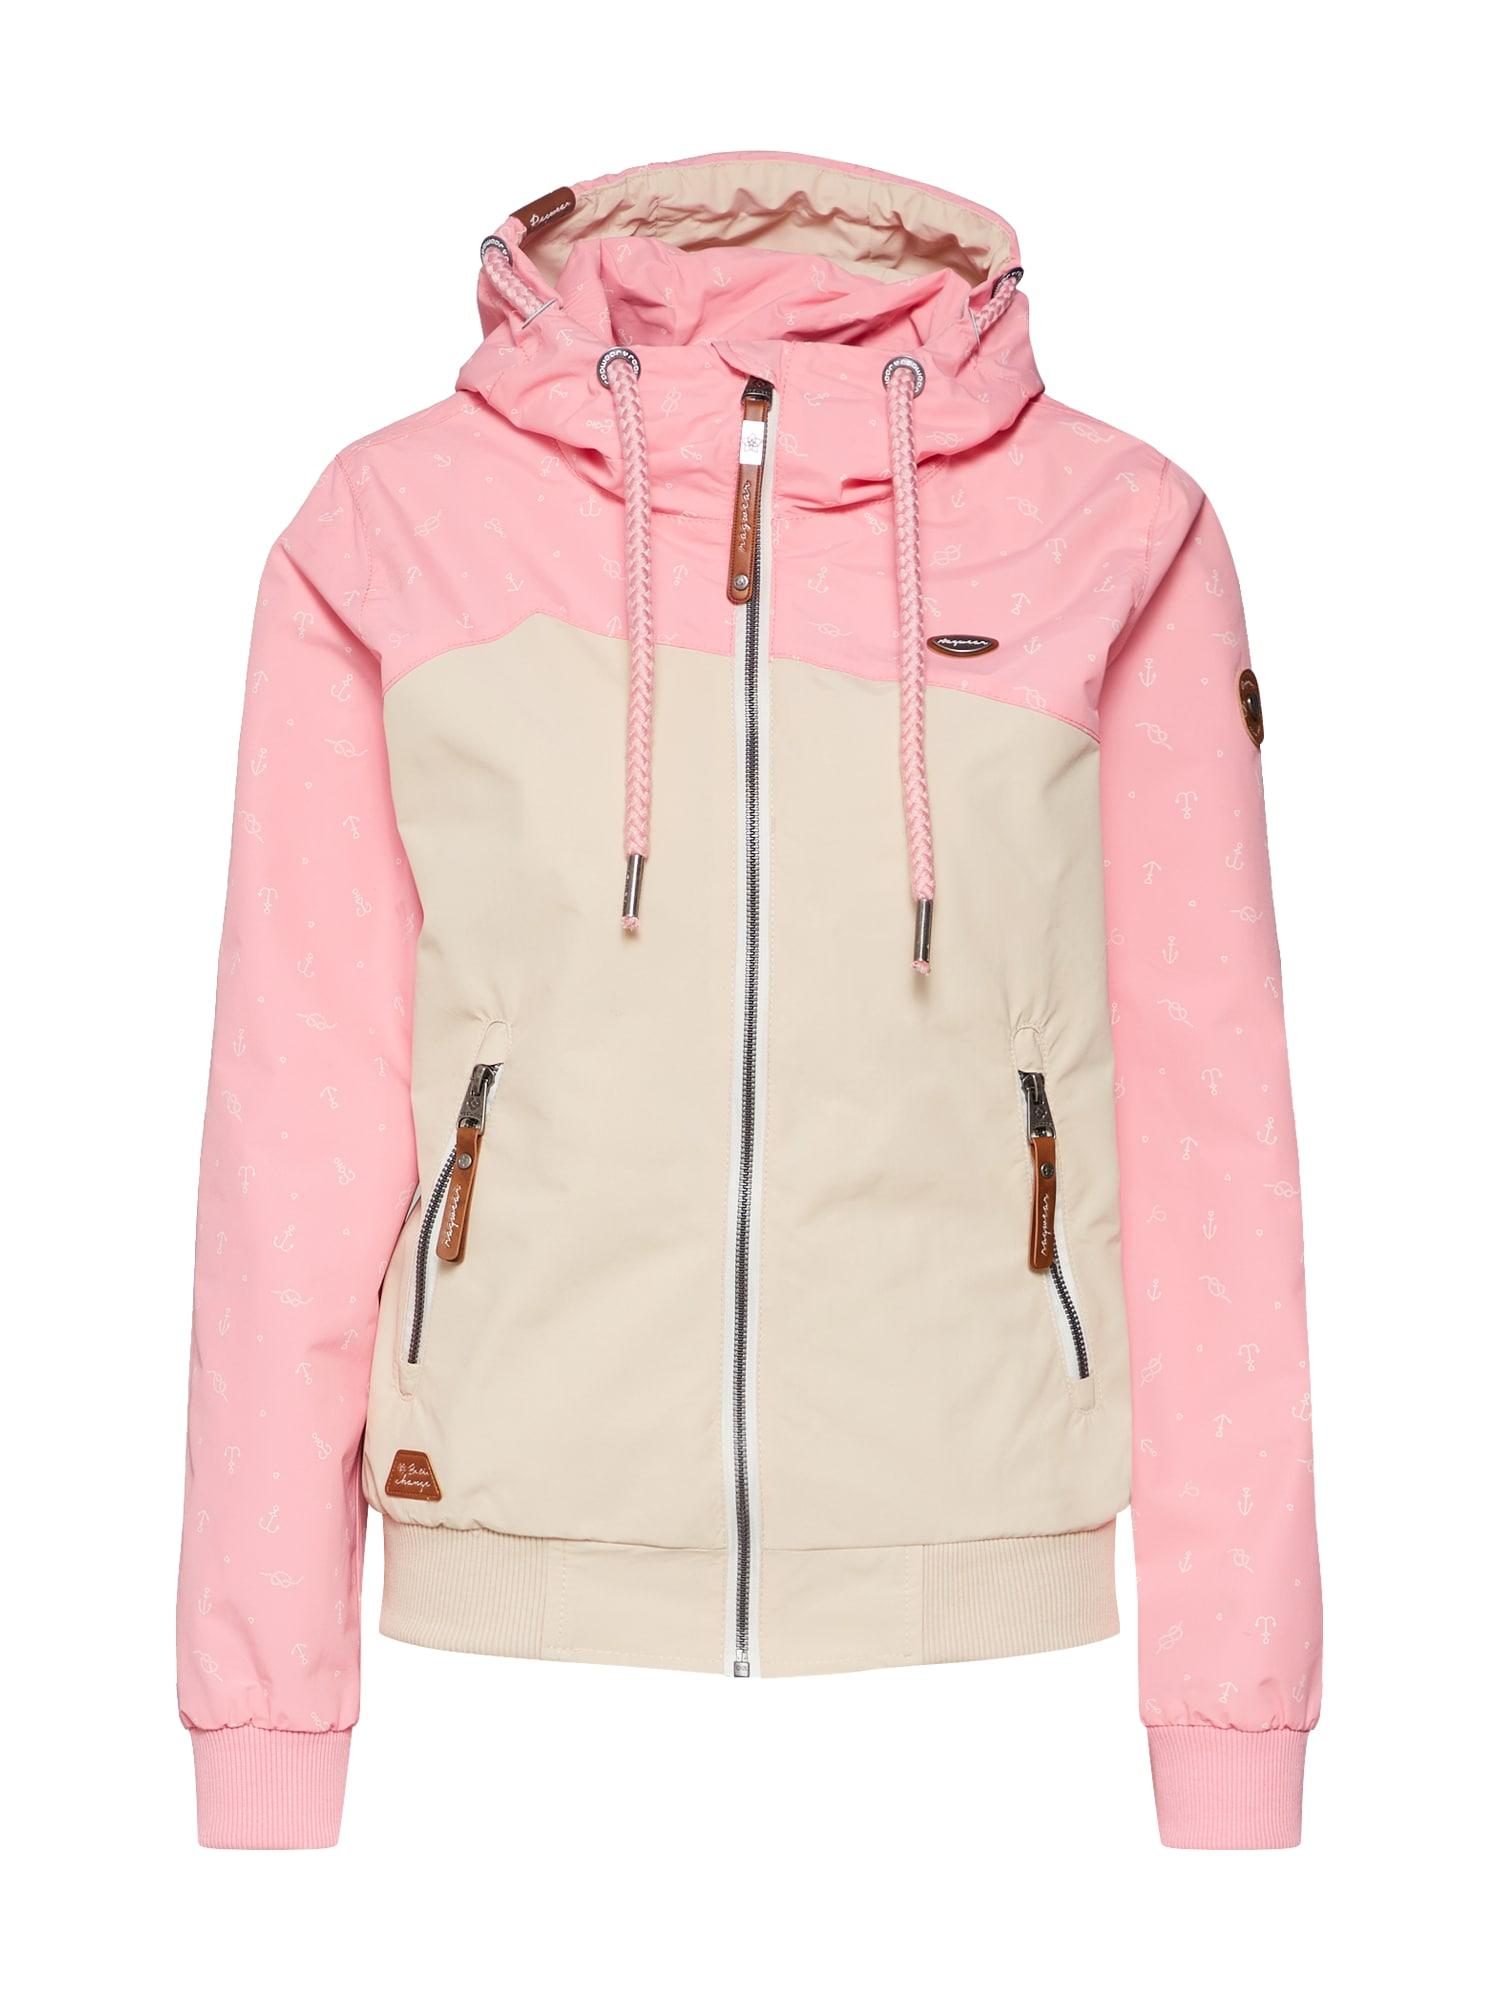 Přechodná bunda Nuggie B mix barev pink Ragwear